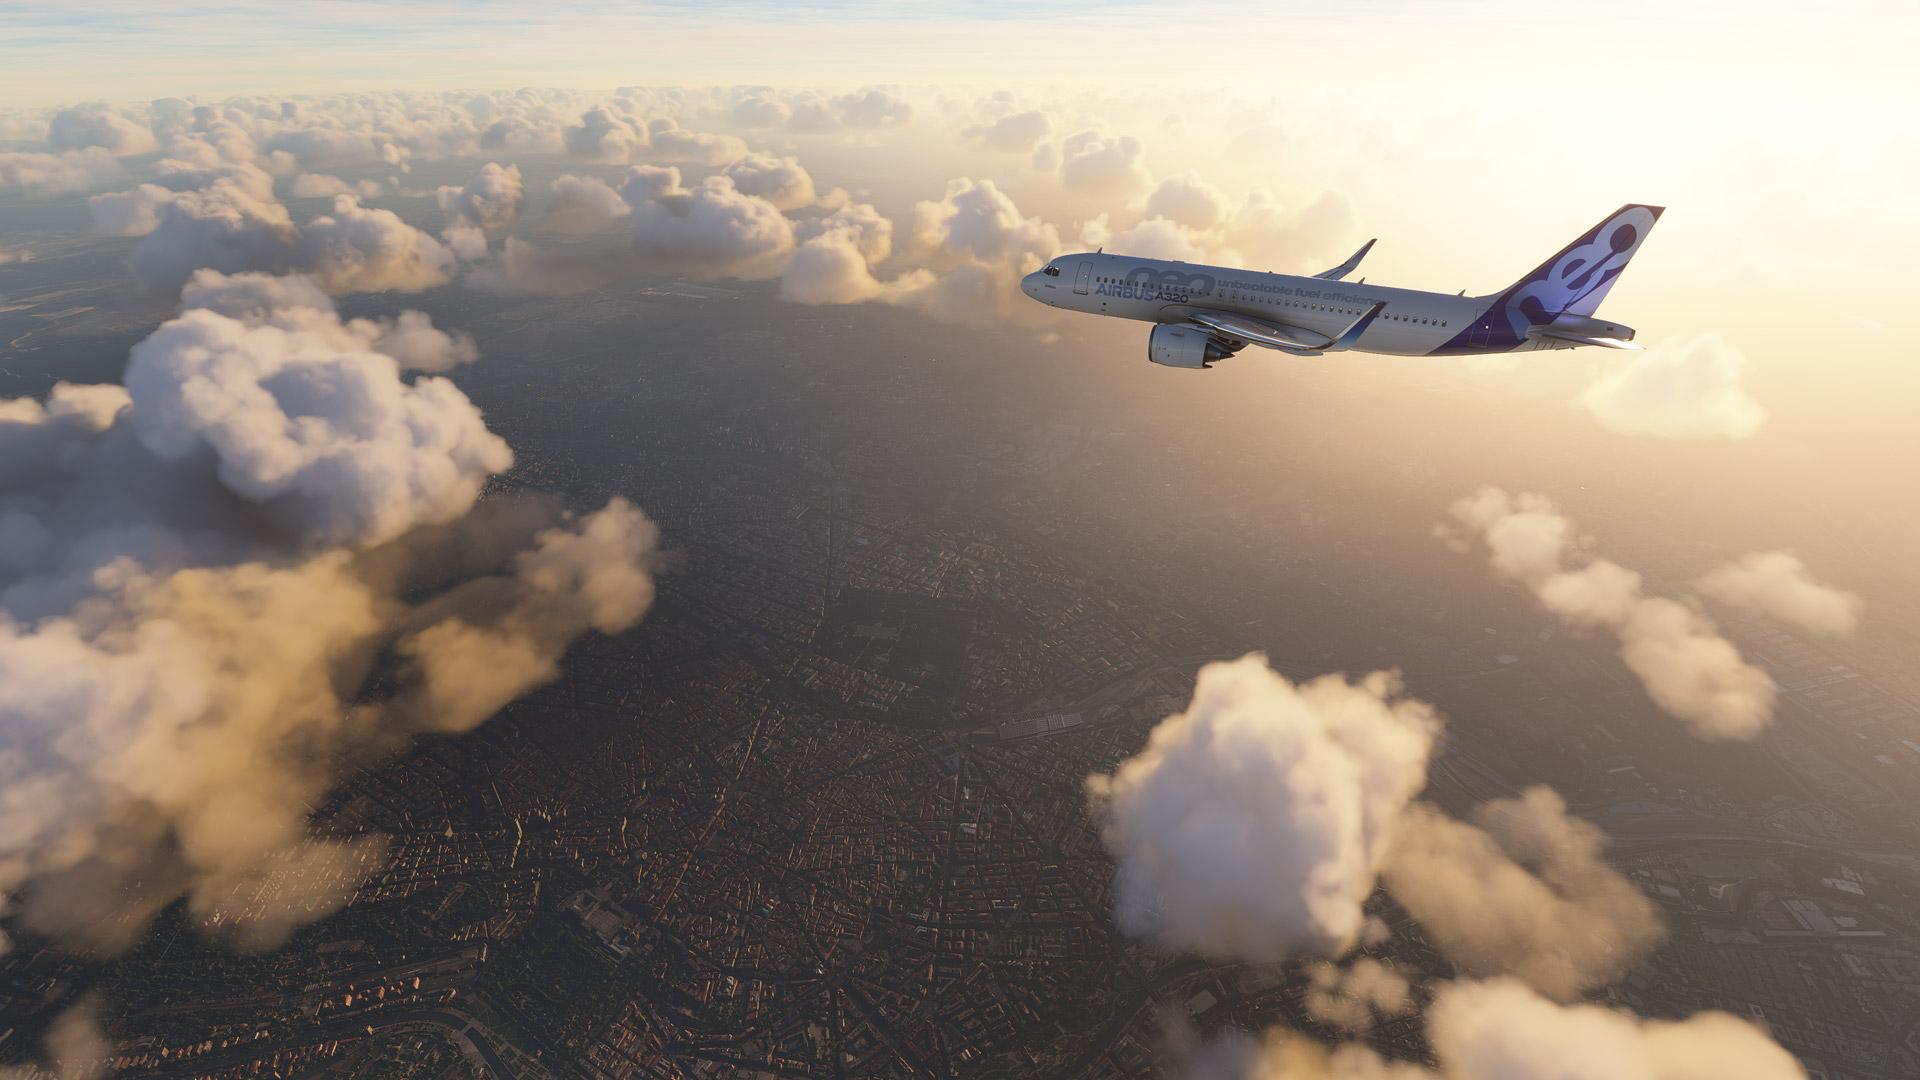 microsoft flight simulator wallpaper 72754